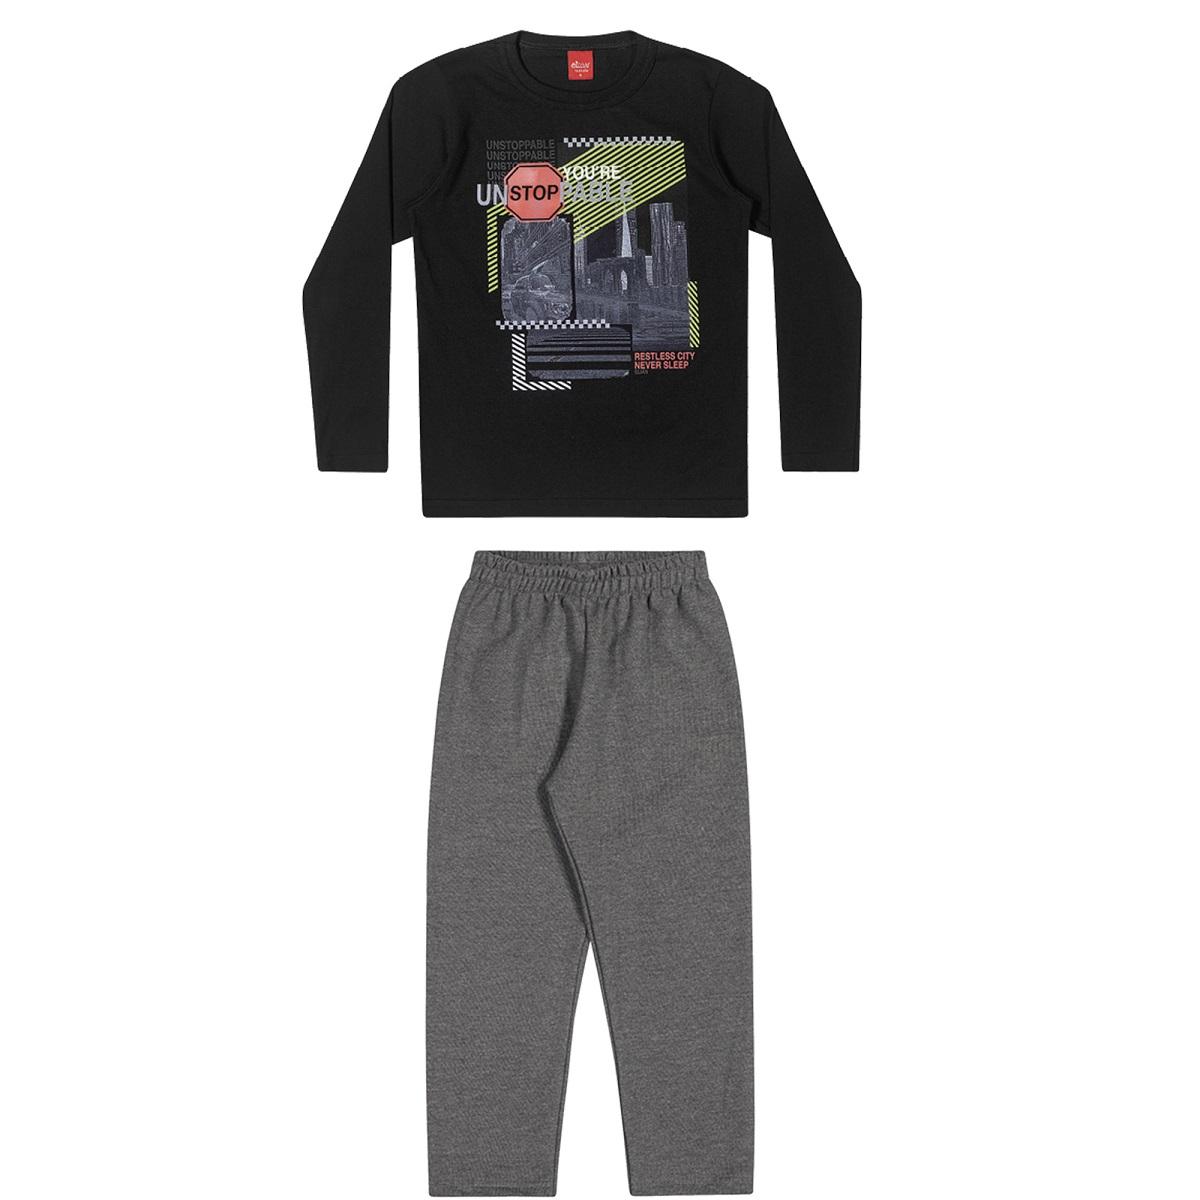 Conjunto Infantil Masculino Camiseta e Calça - ELIAN 241045